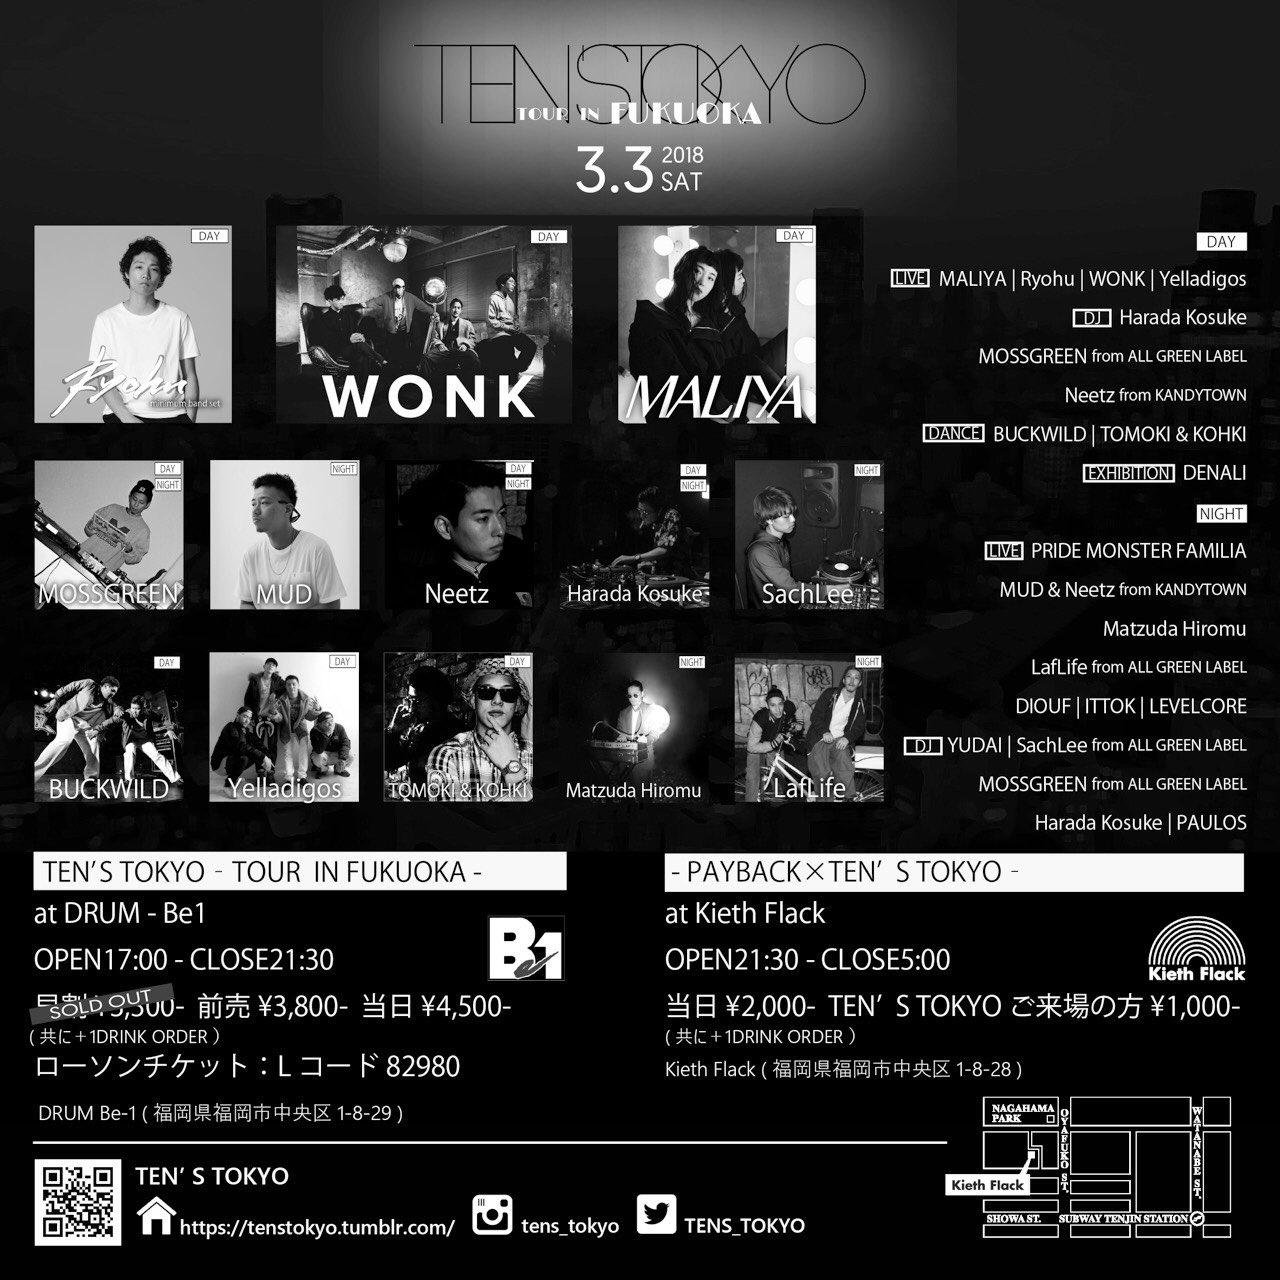 TEN'S TOKYO TOUR FUKUOKA flyer.jpeg